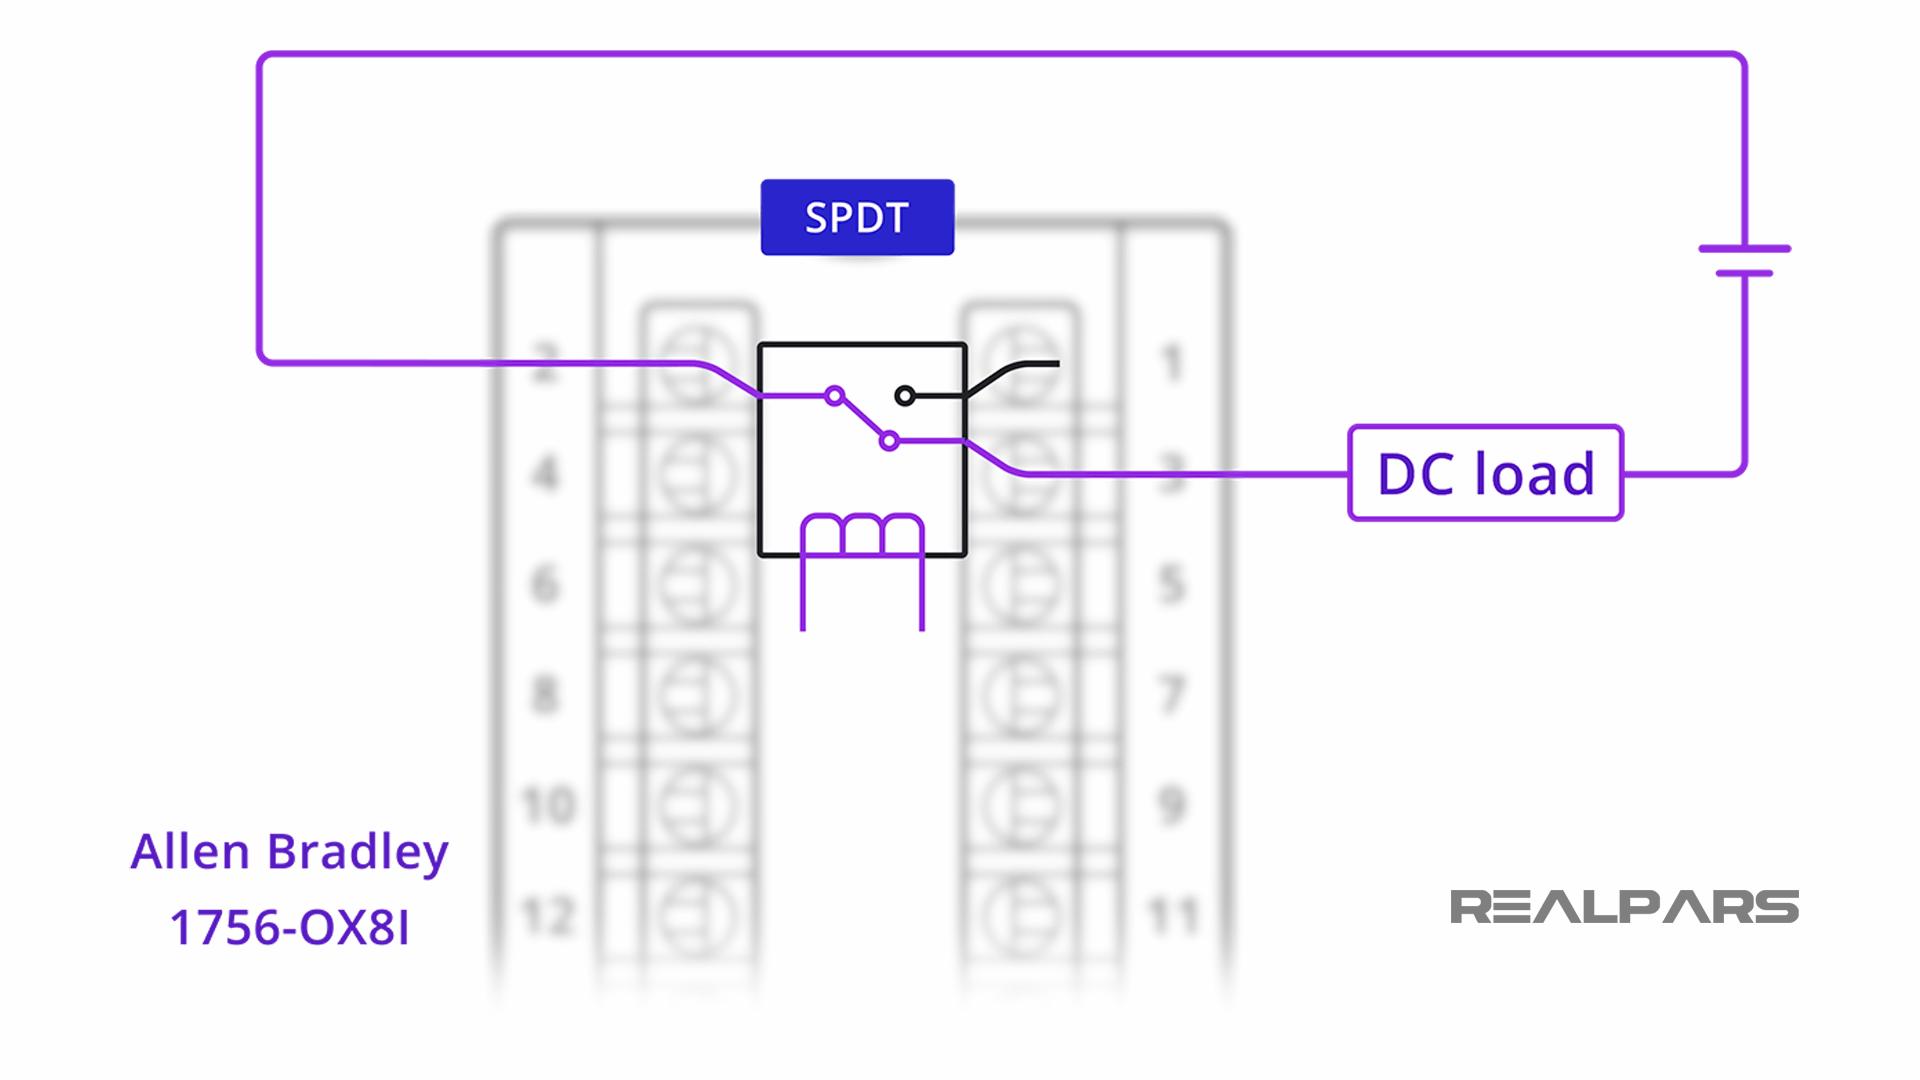 Single Pole Double Throw (SPDT) Relay